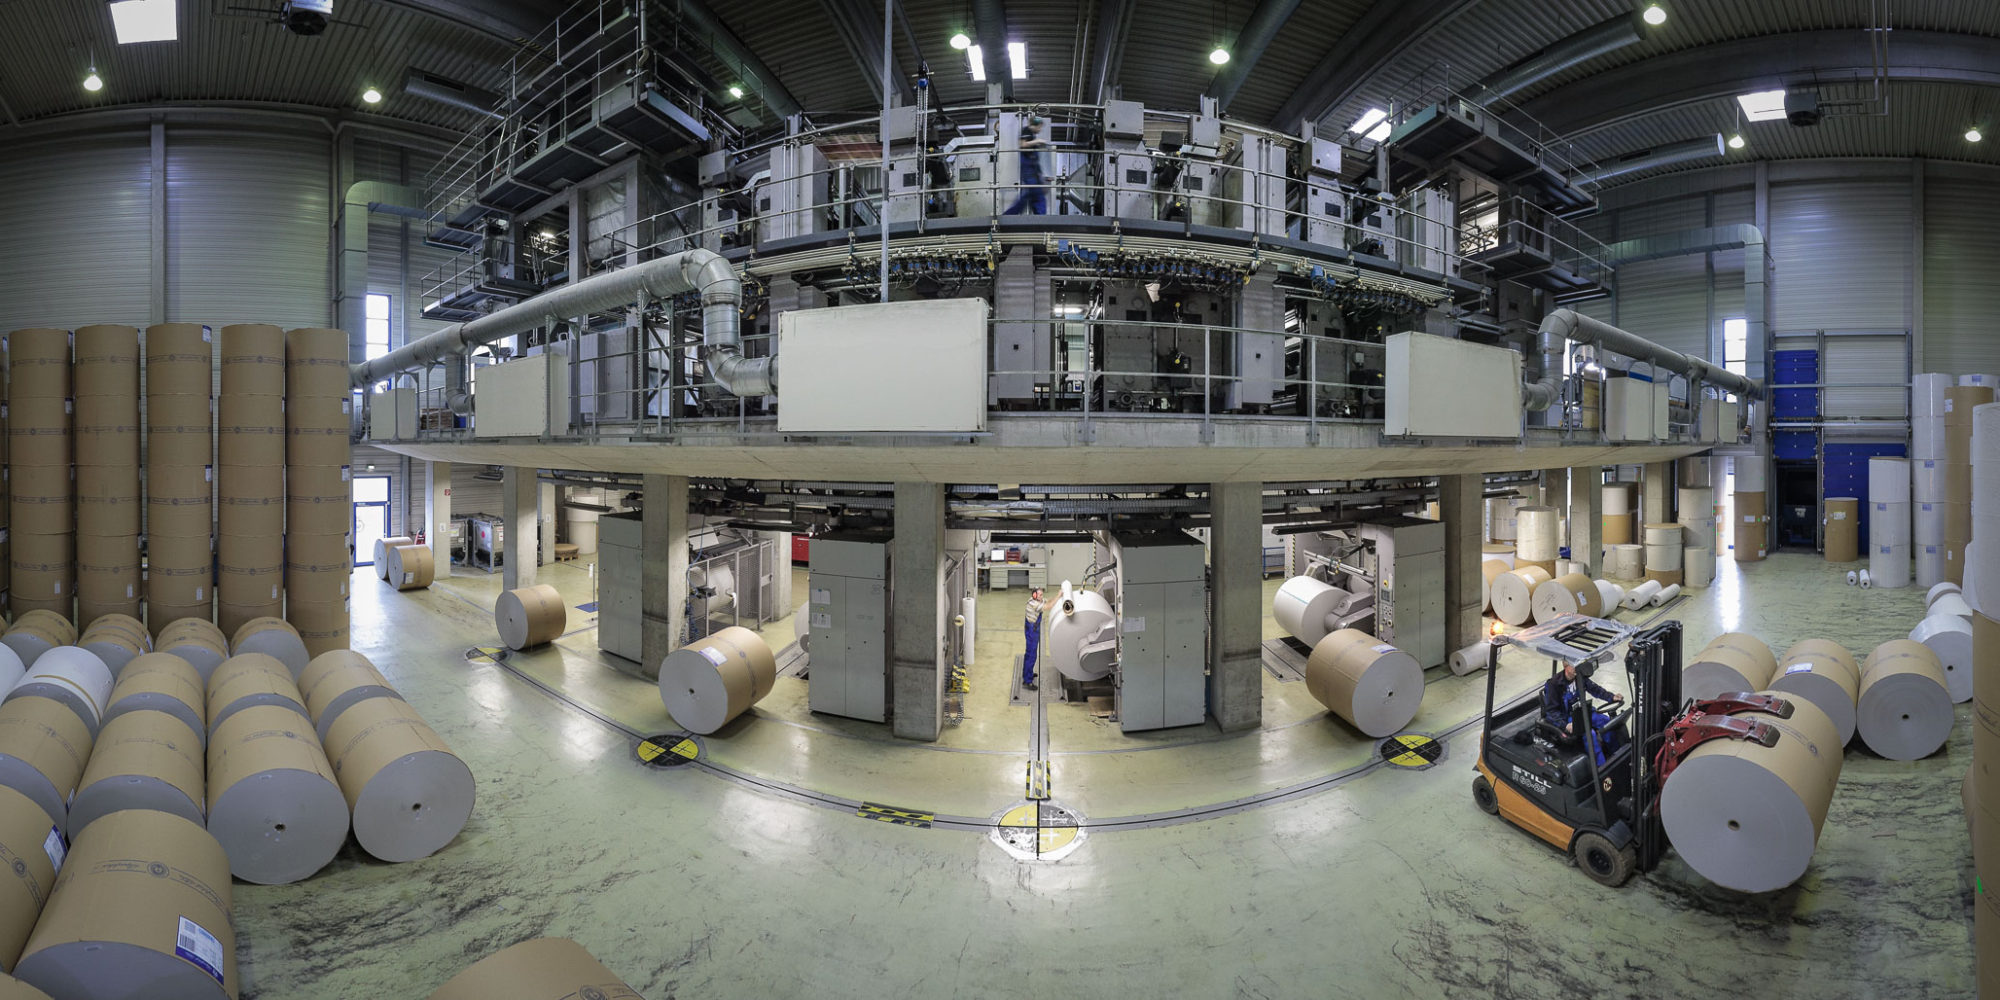 Maschinenhalle 360 Video